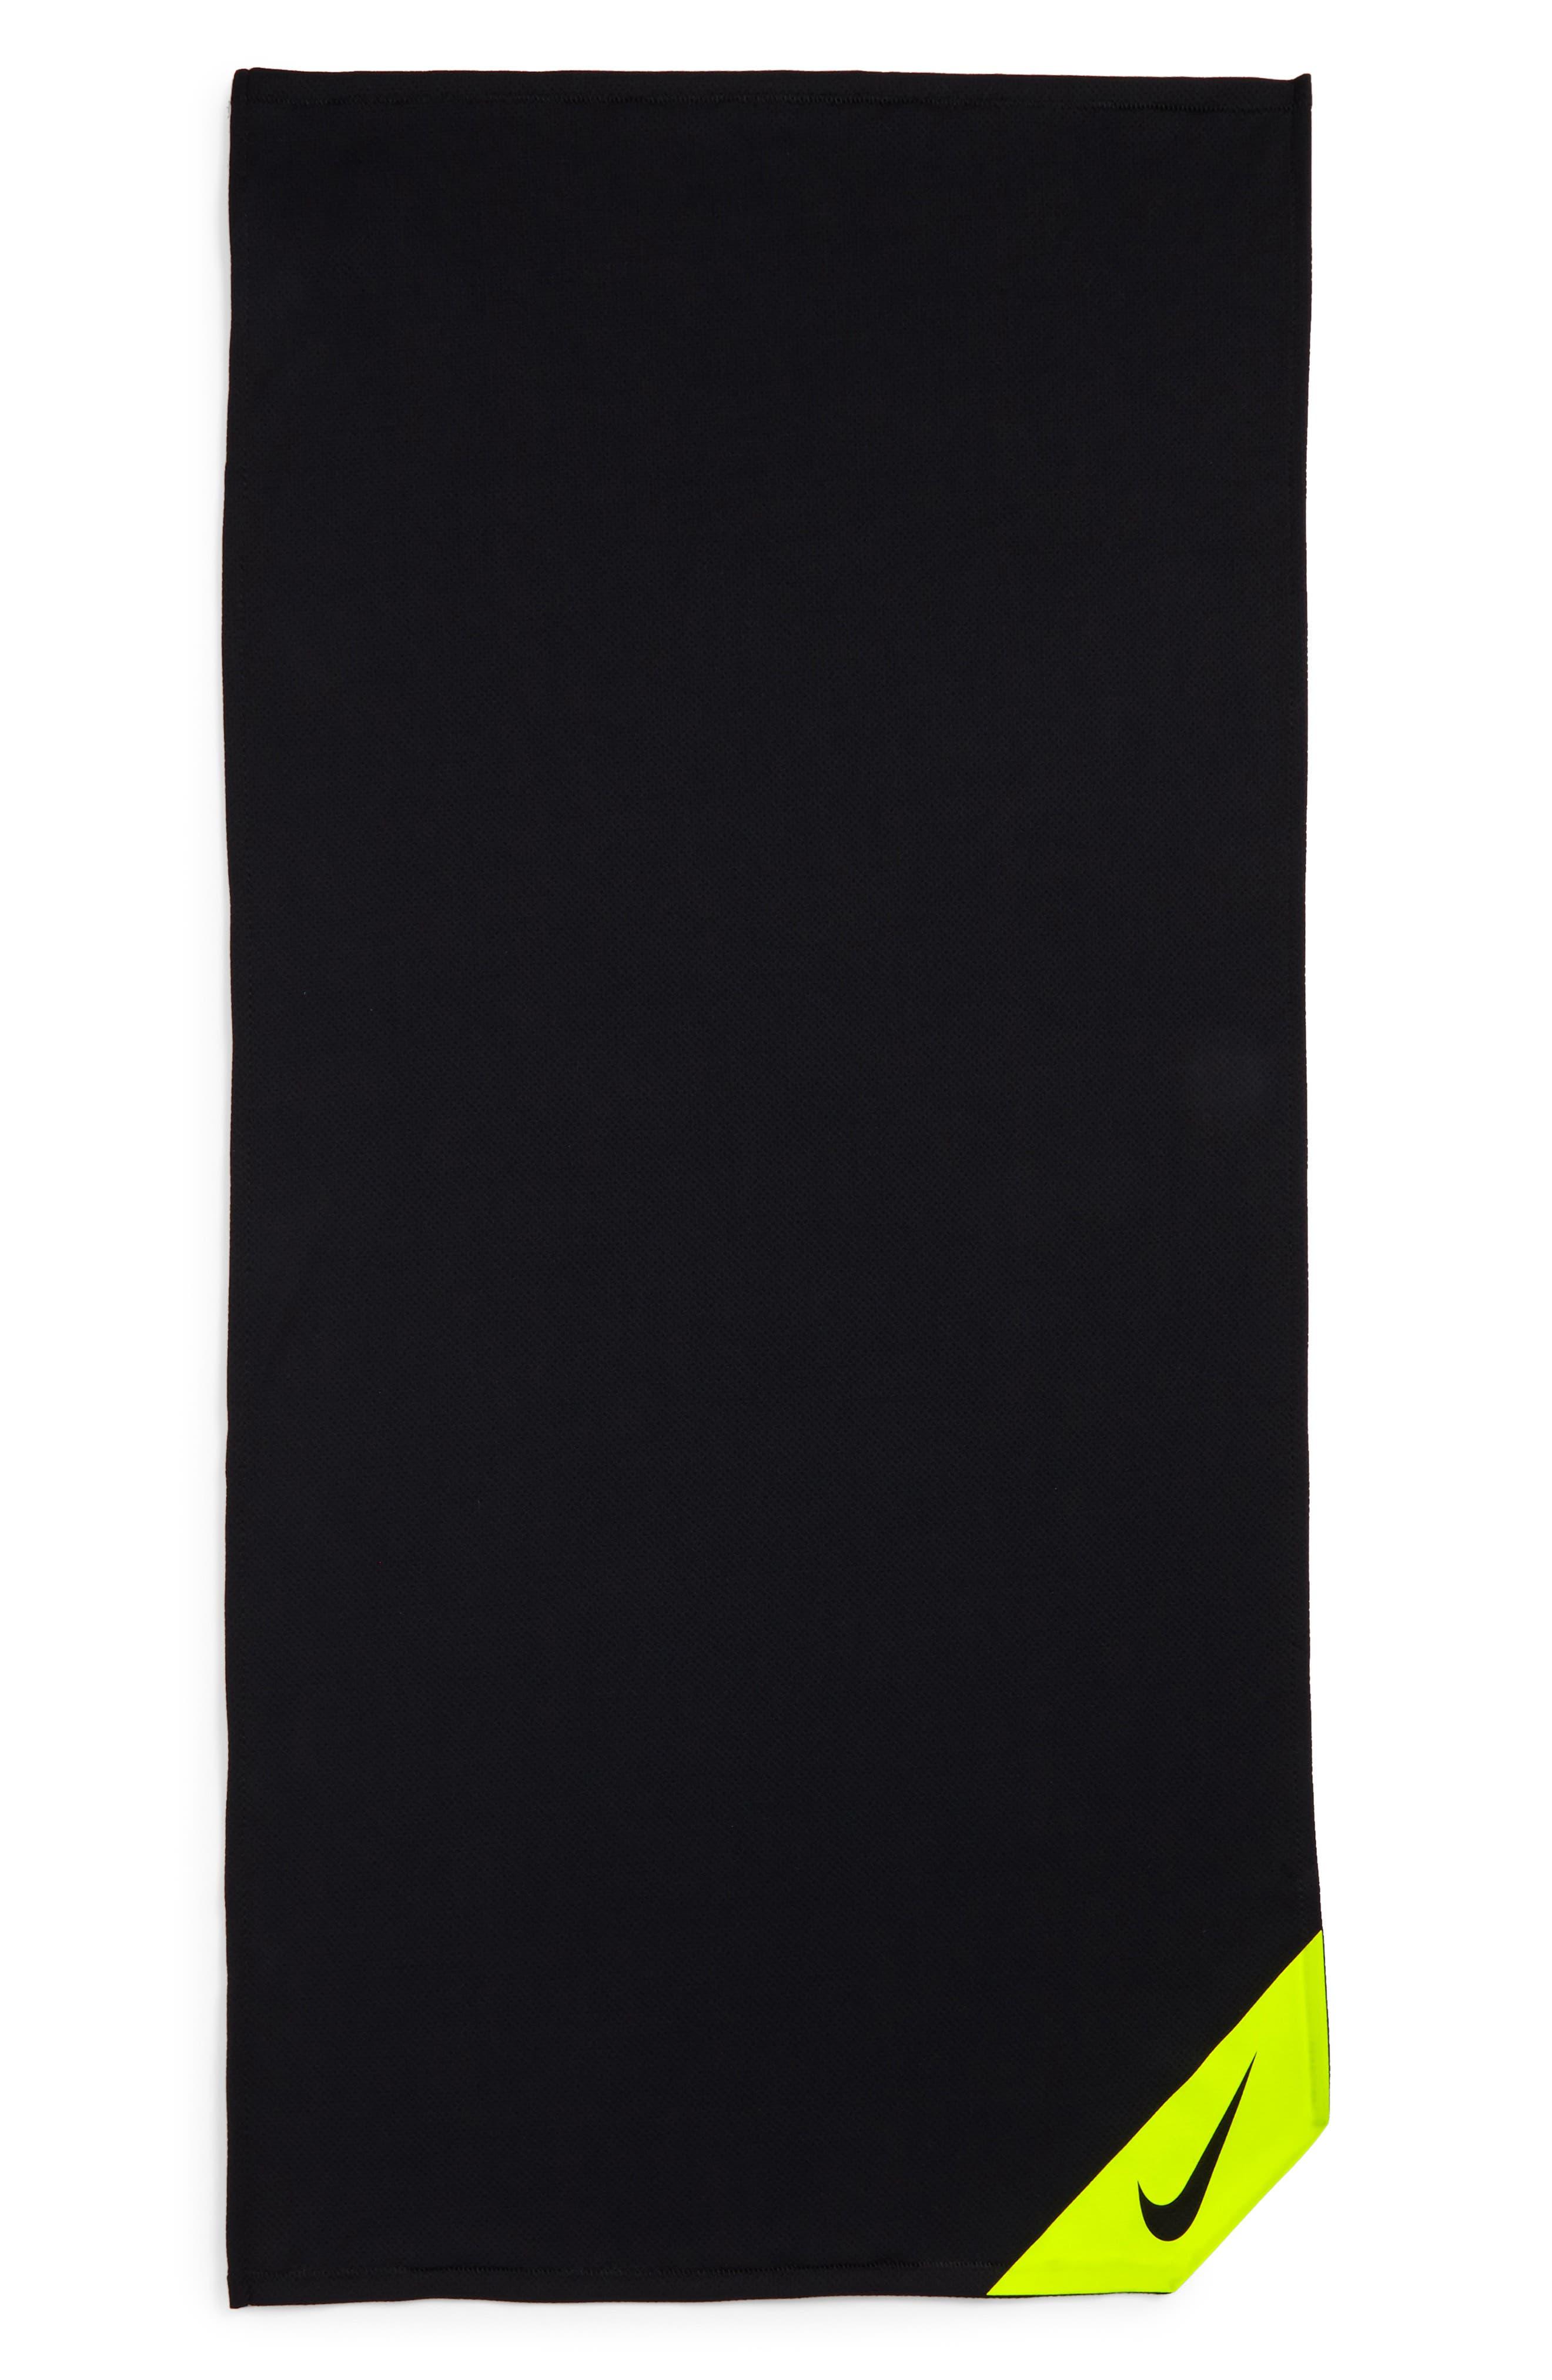 Small Cooling Towel,                             Main thumbnail 1, color,                             Black/ Volt